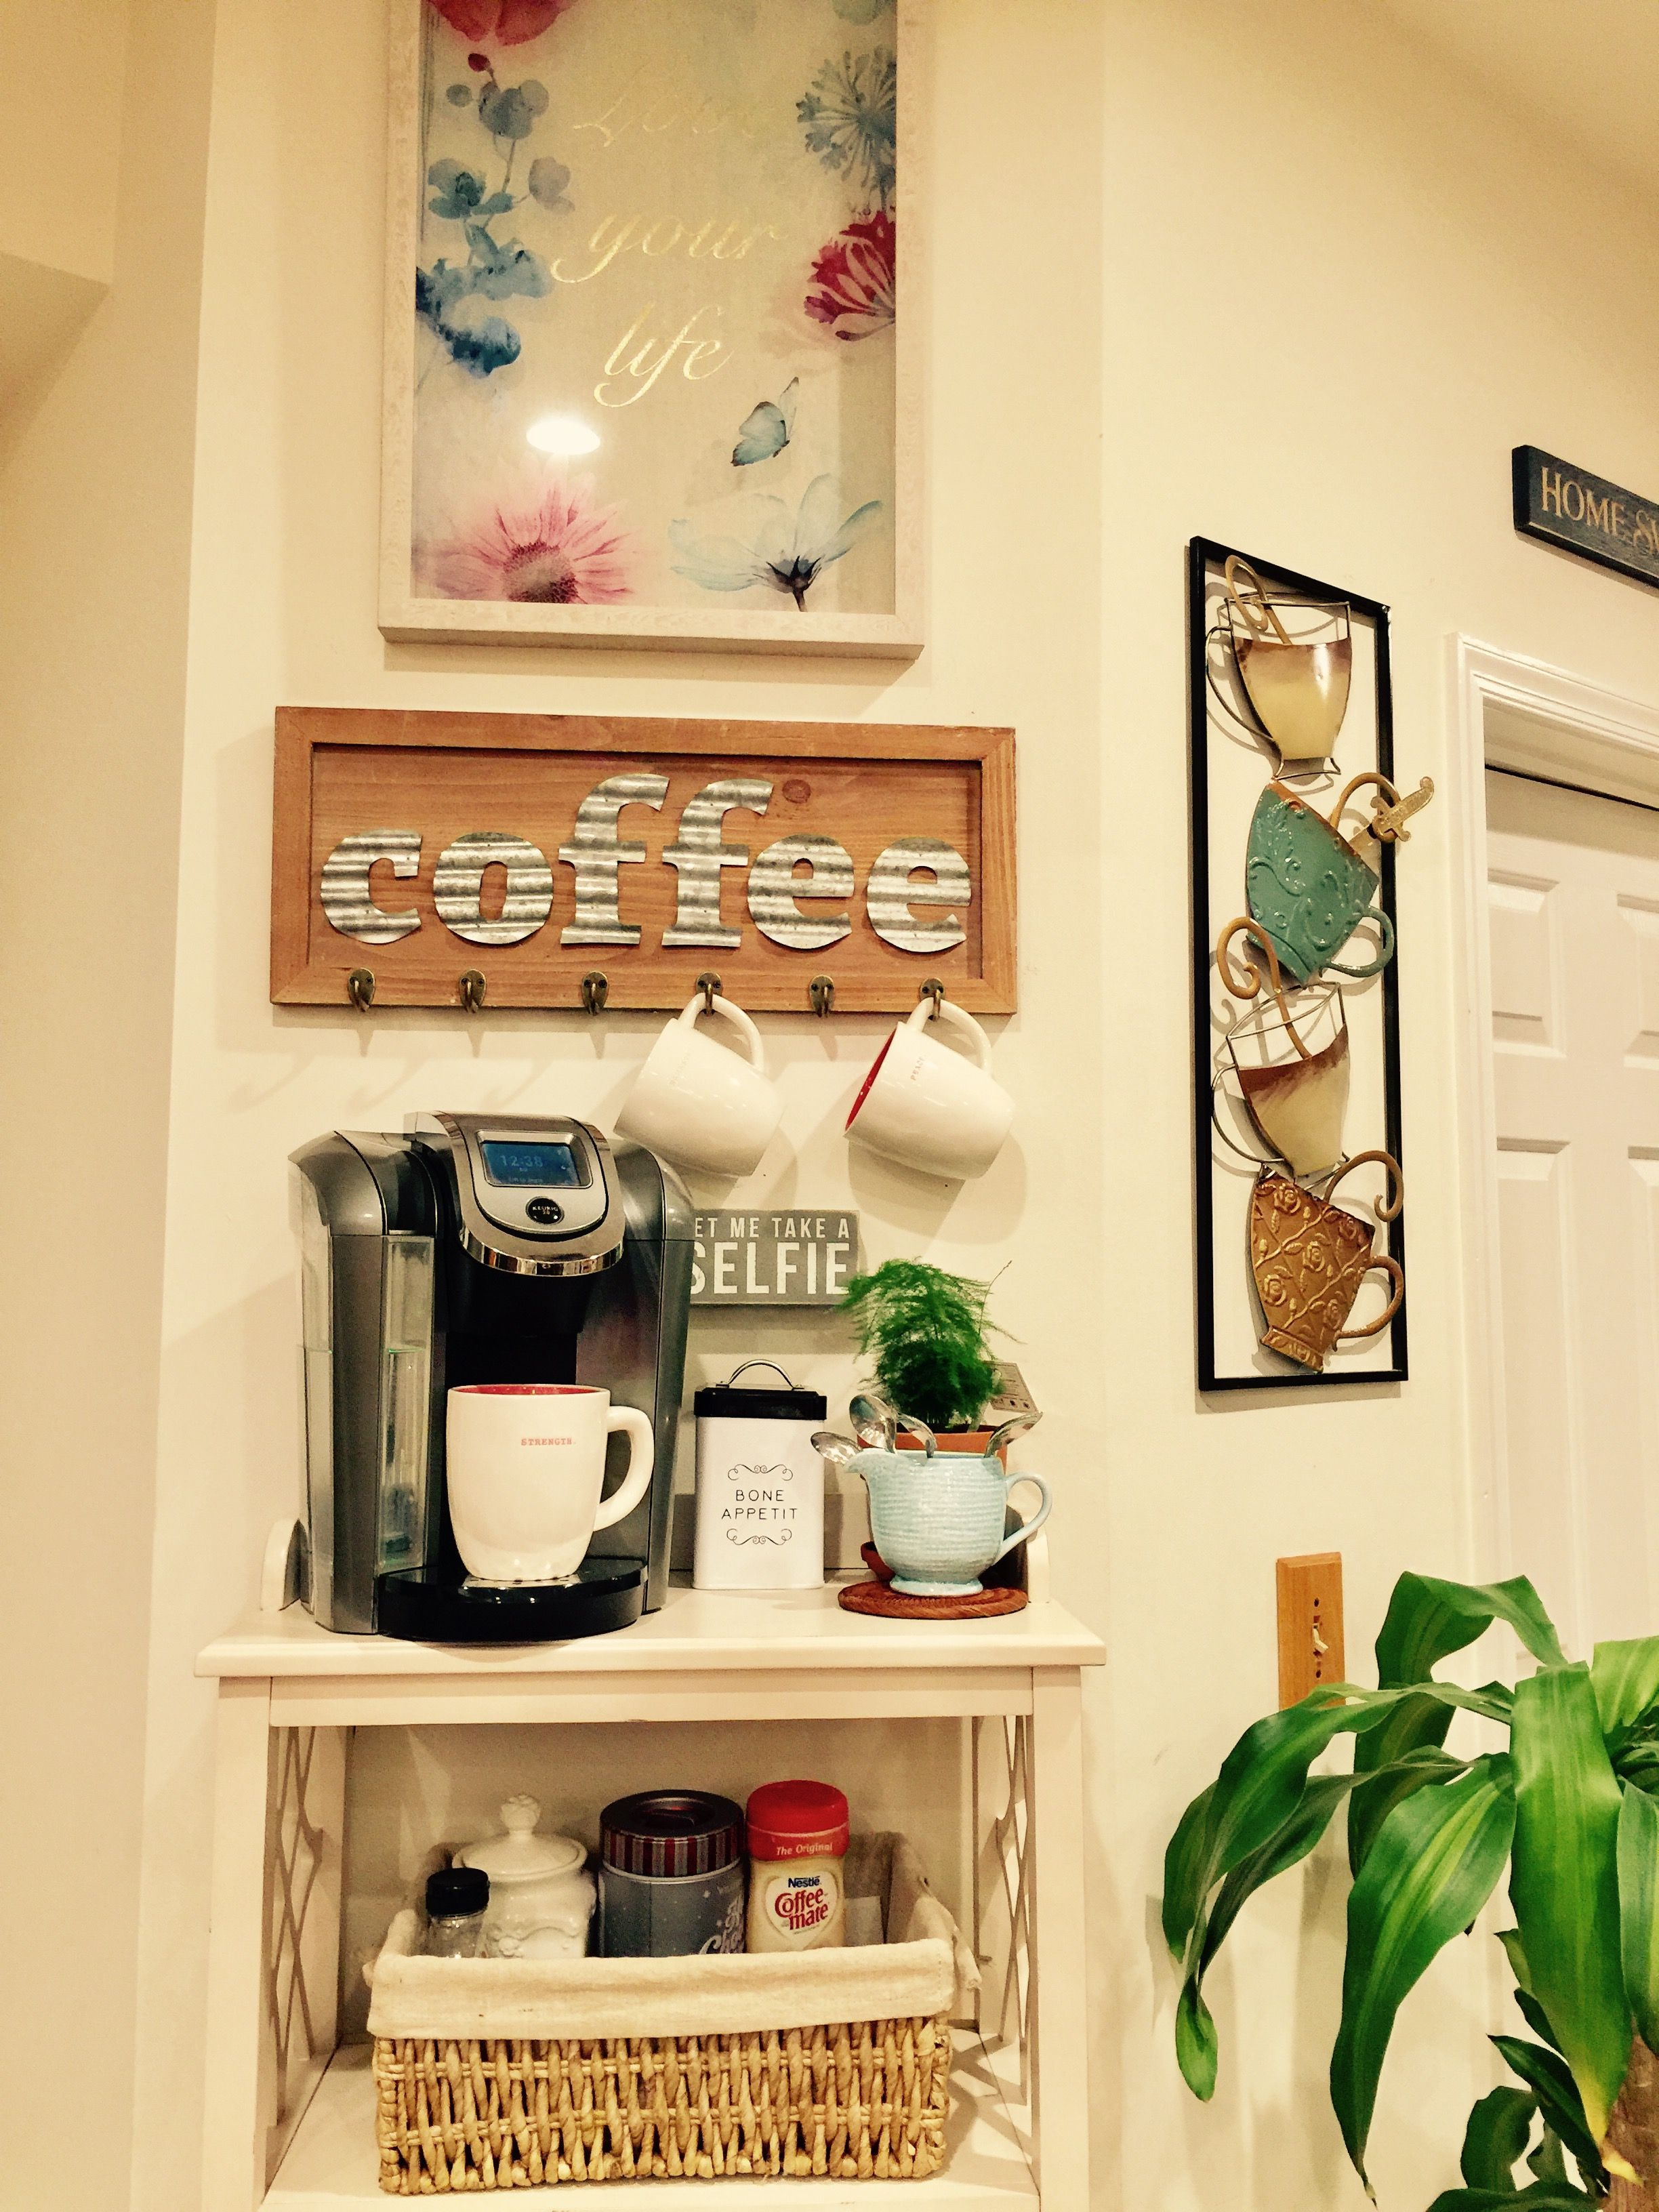 Coffe bar idea. My relaxing corner   Coffee bar decor   Pinterest ...